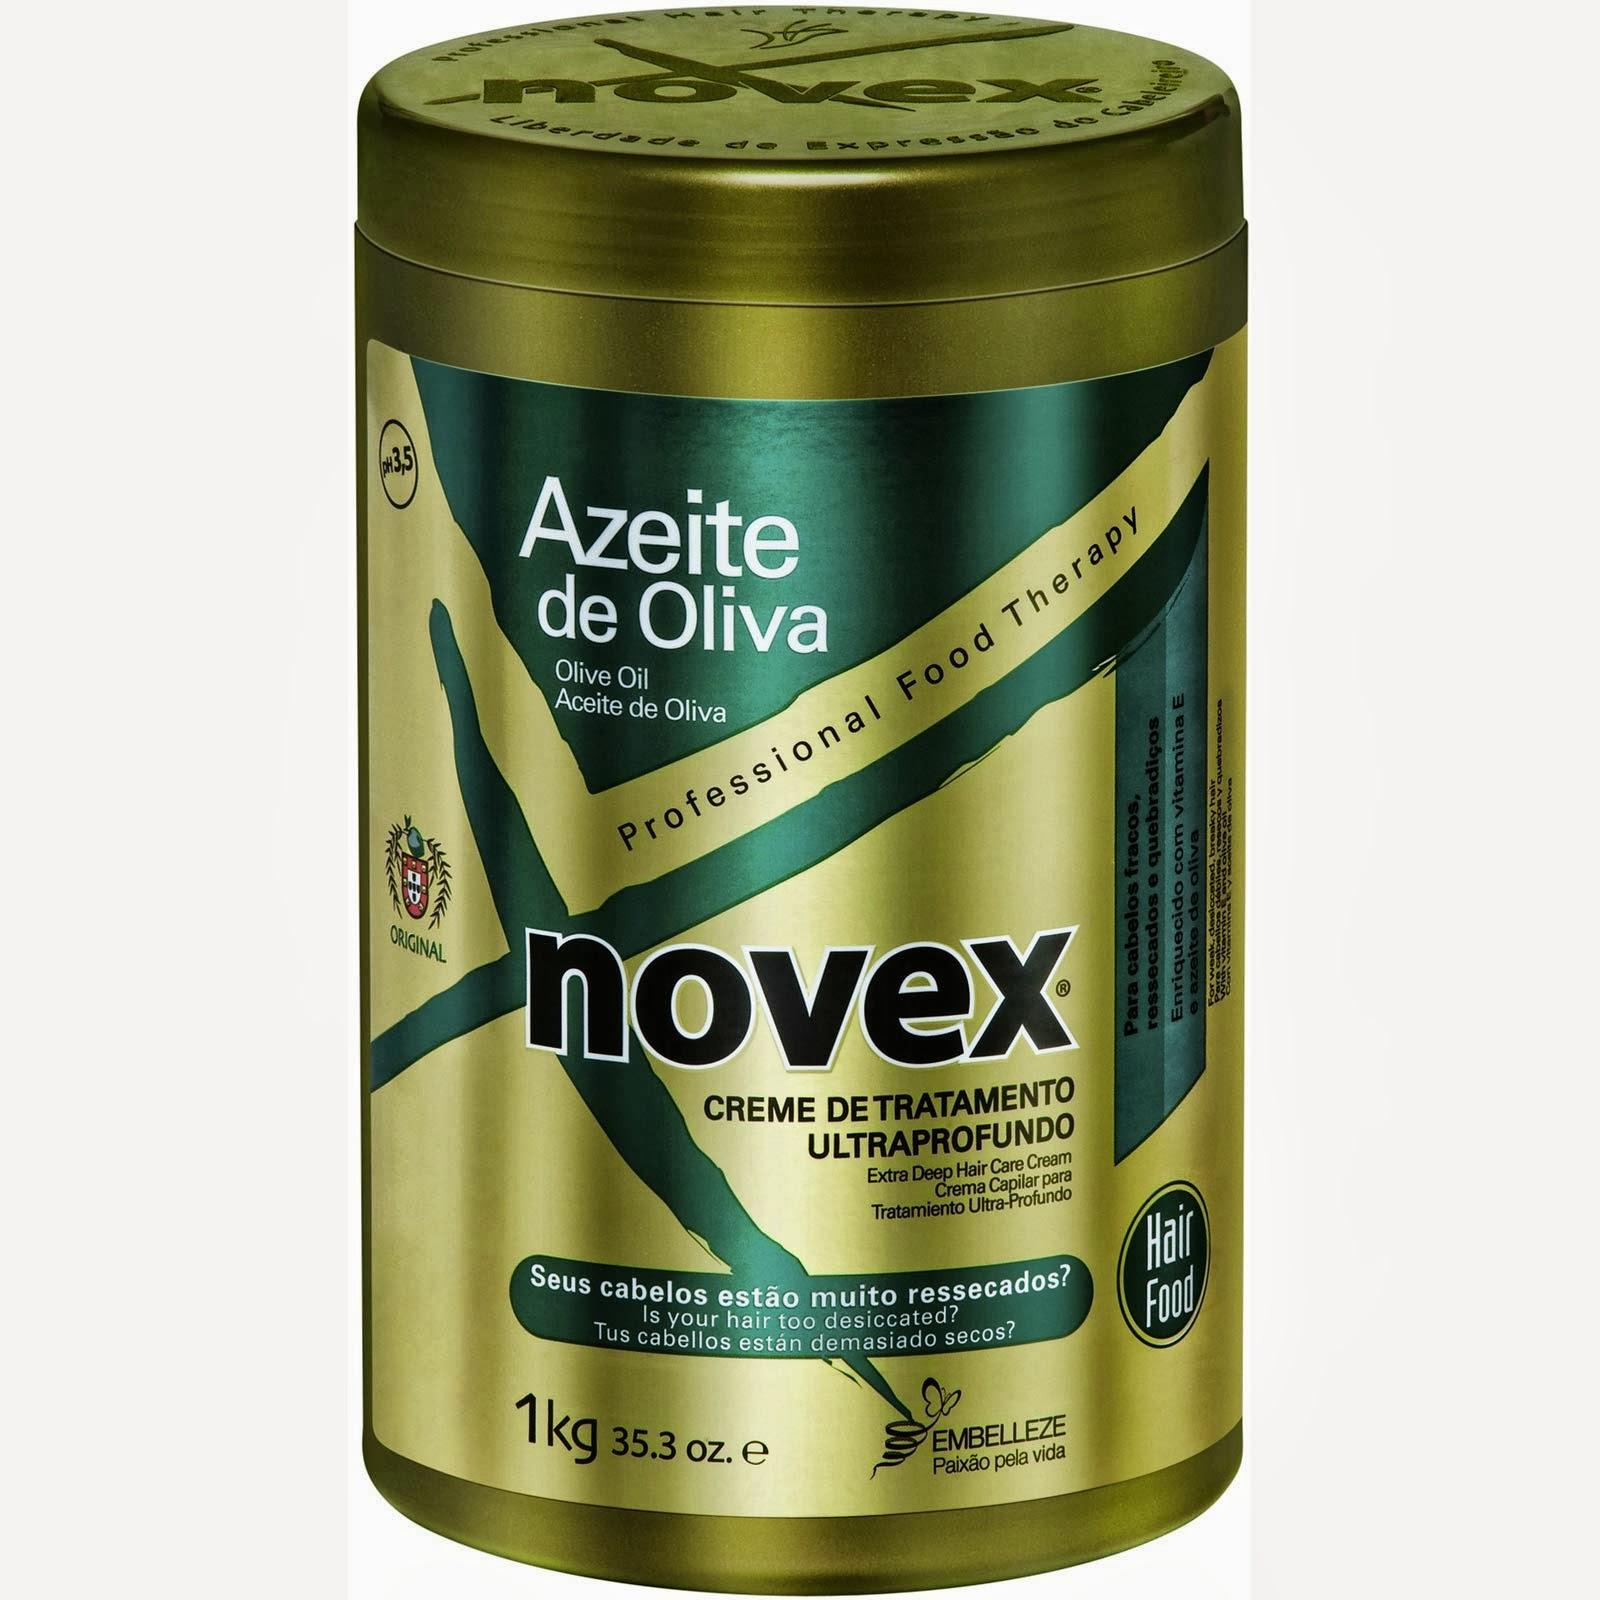 Novex Azeite de Oliva Cronograma Capilar Novex Azeite de Oliva